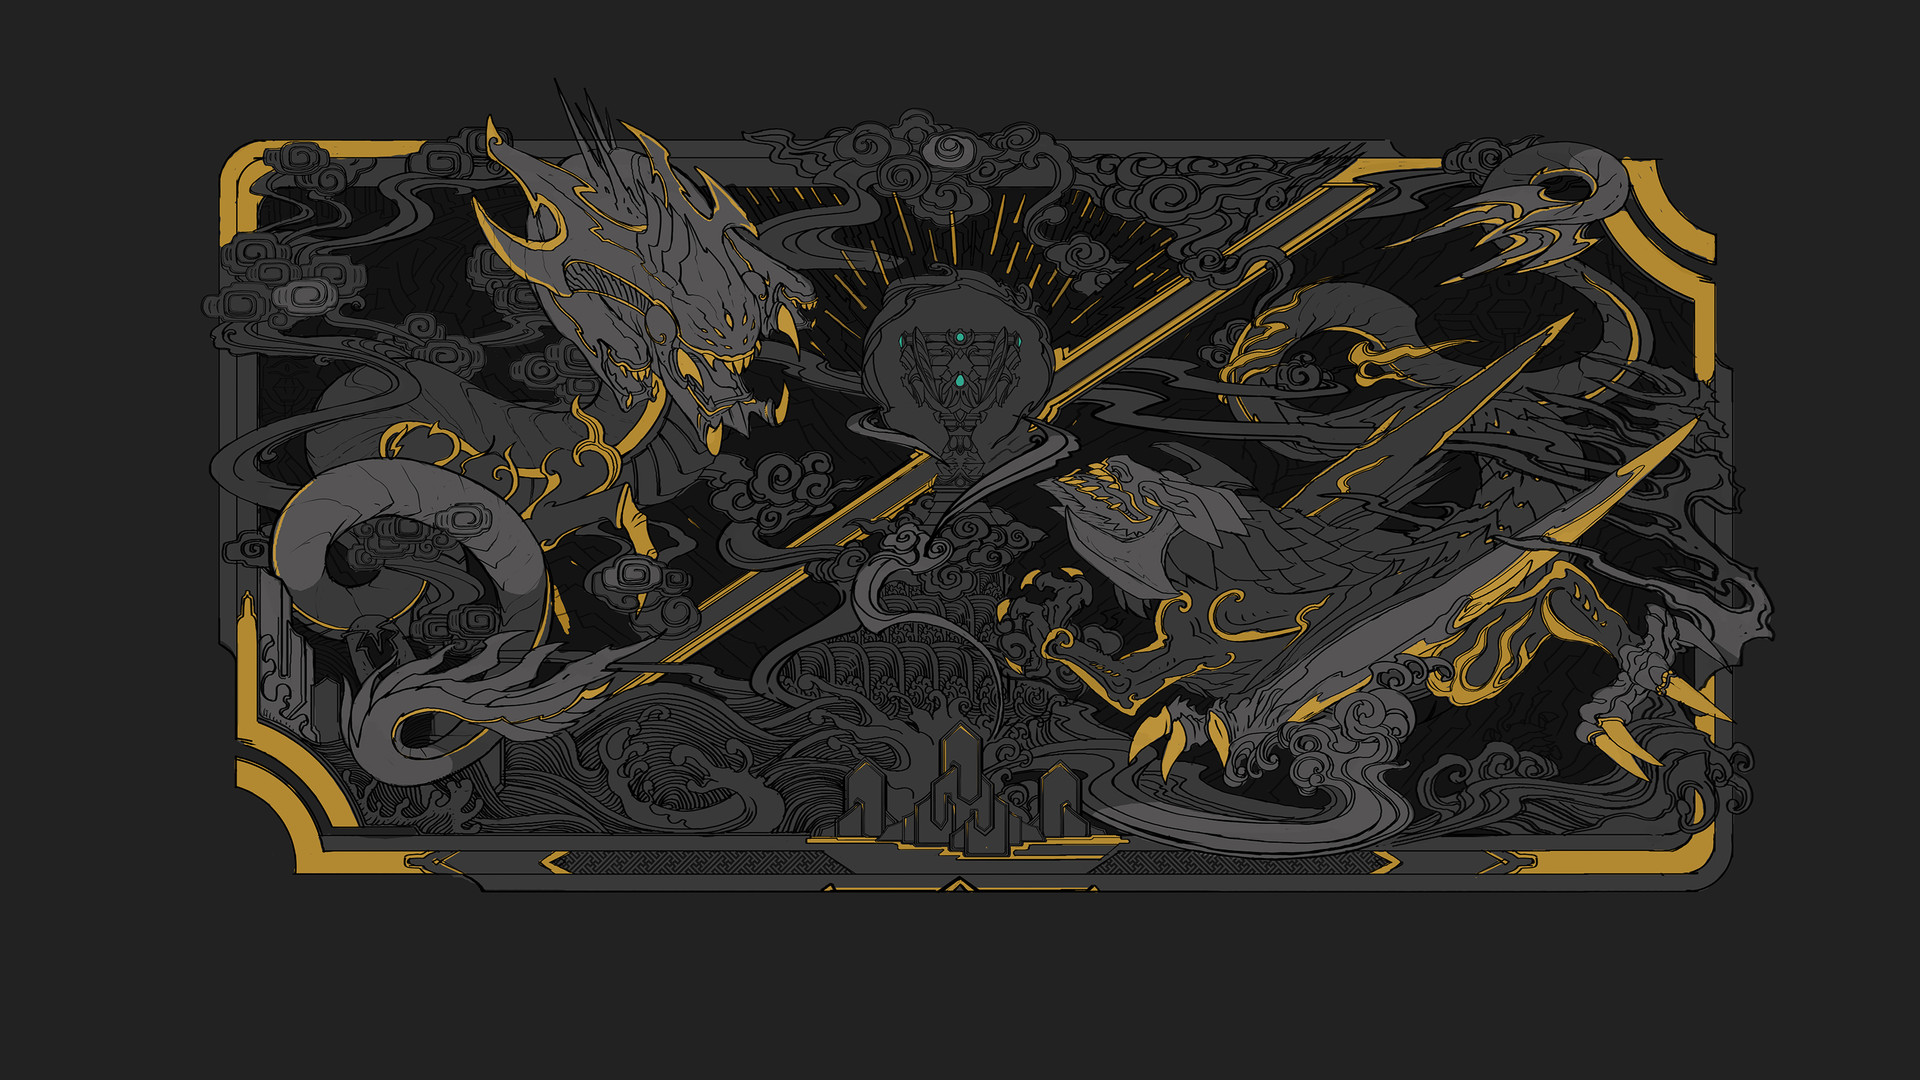 Artstation The Concept Art Of League Of Legends World